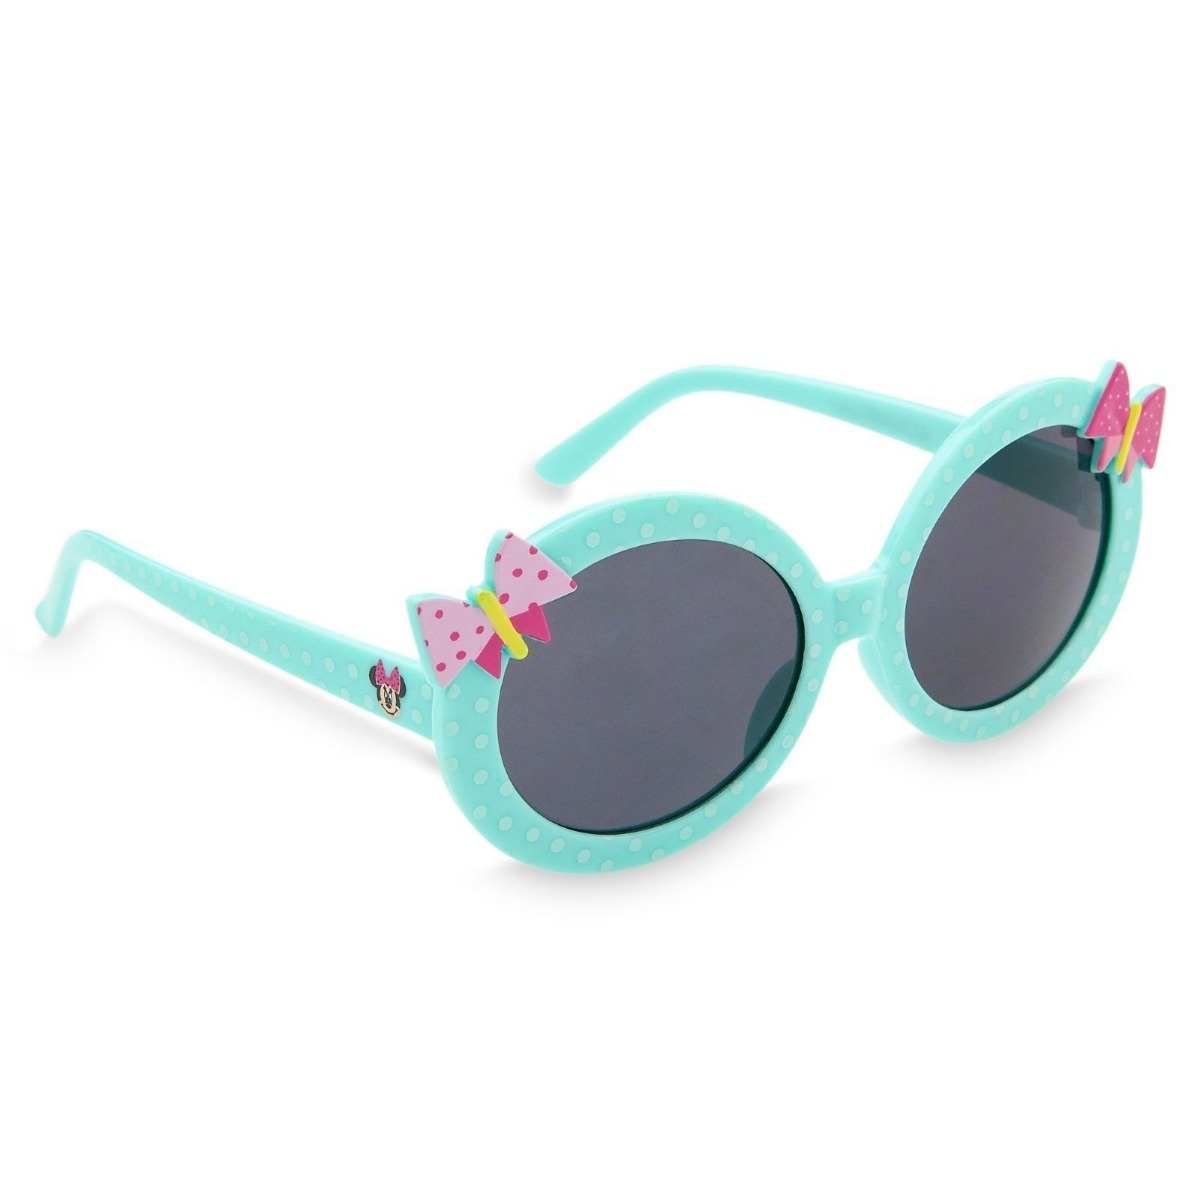 2033d304189ad óculos de sol infantil menina - laço minnie disney + 3 anos. Carregando  zoom.